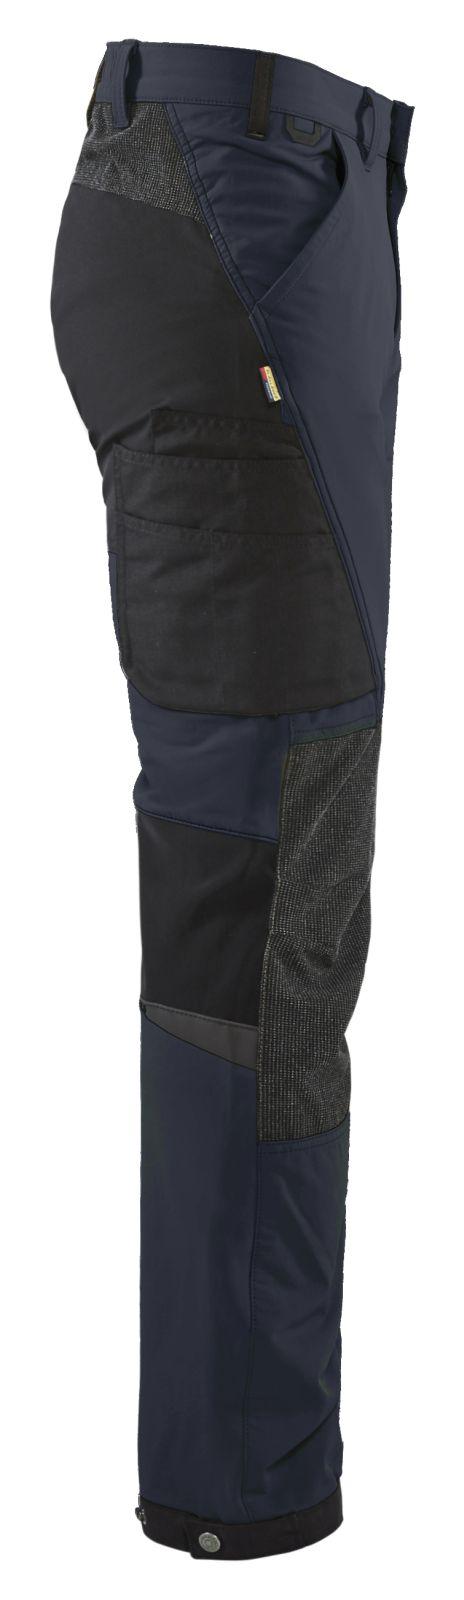 Blaklader Broeken 14221645 donker marineblauw-zwart(8699)